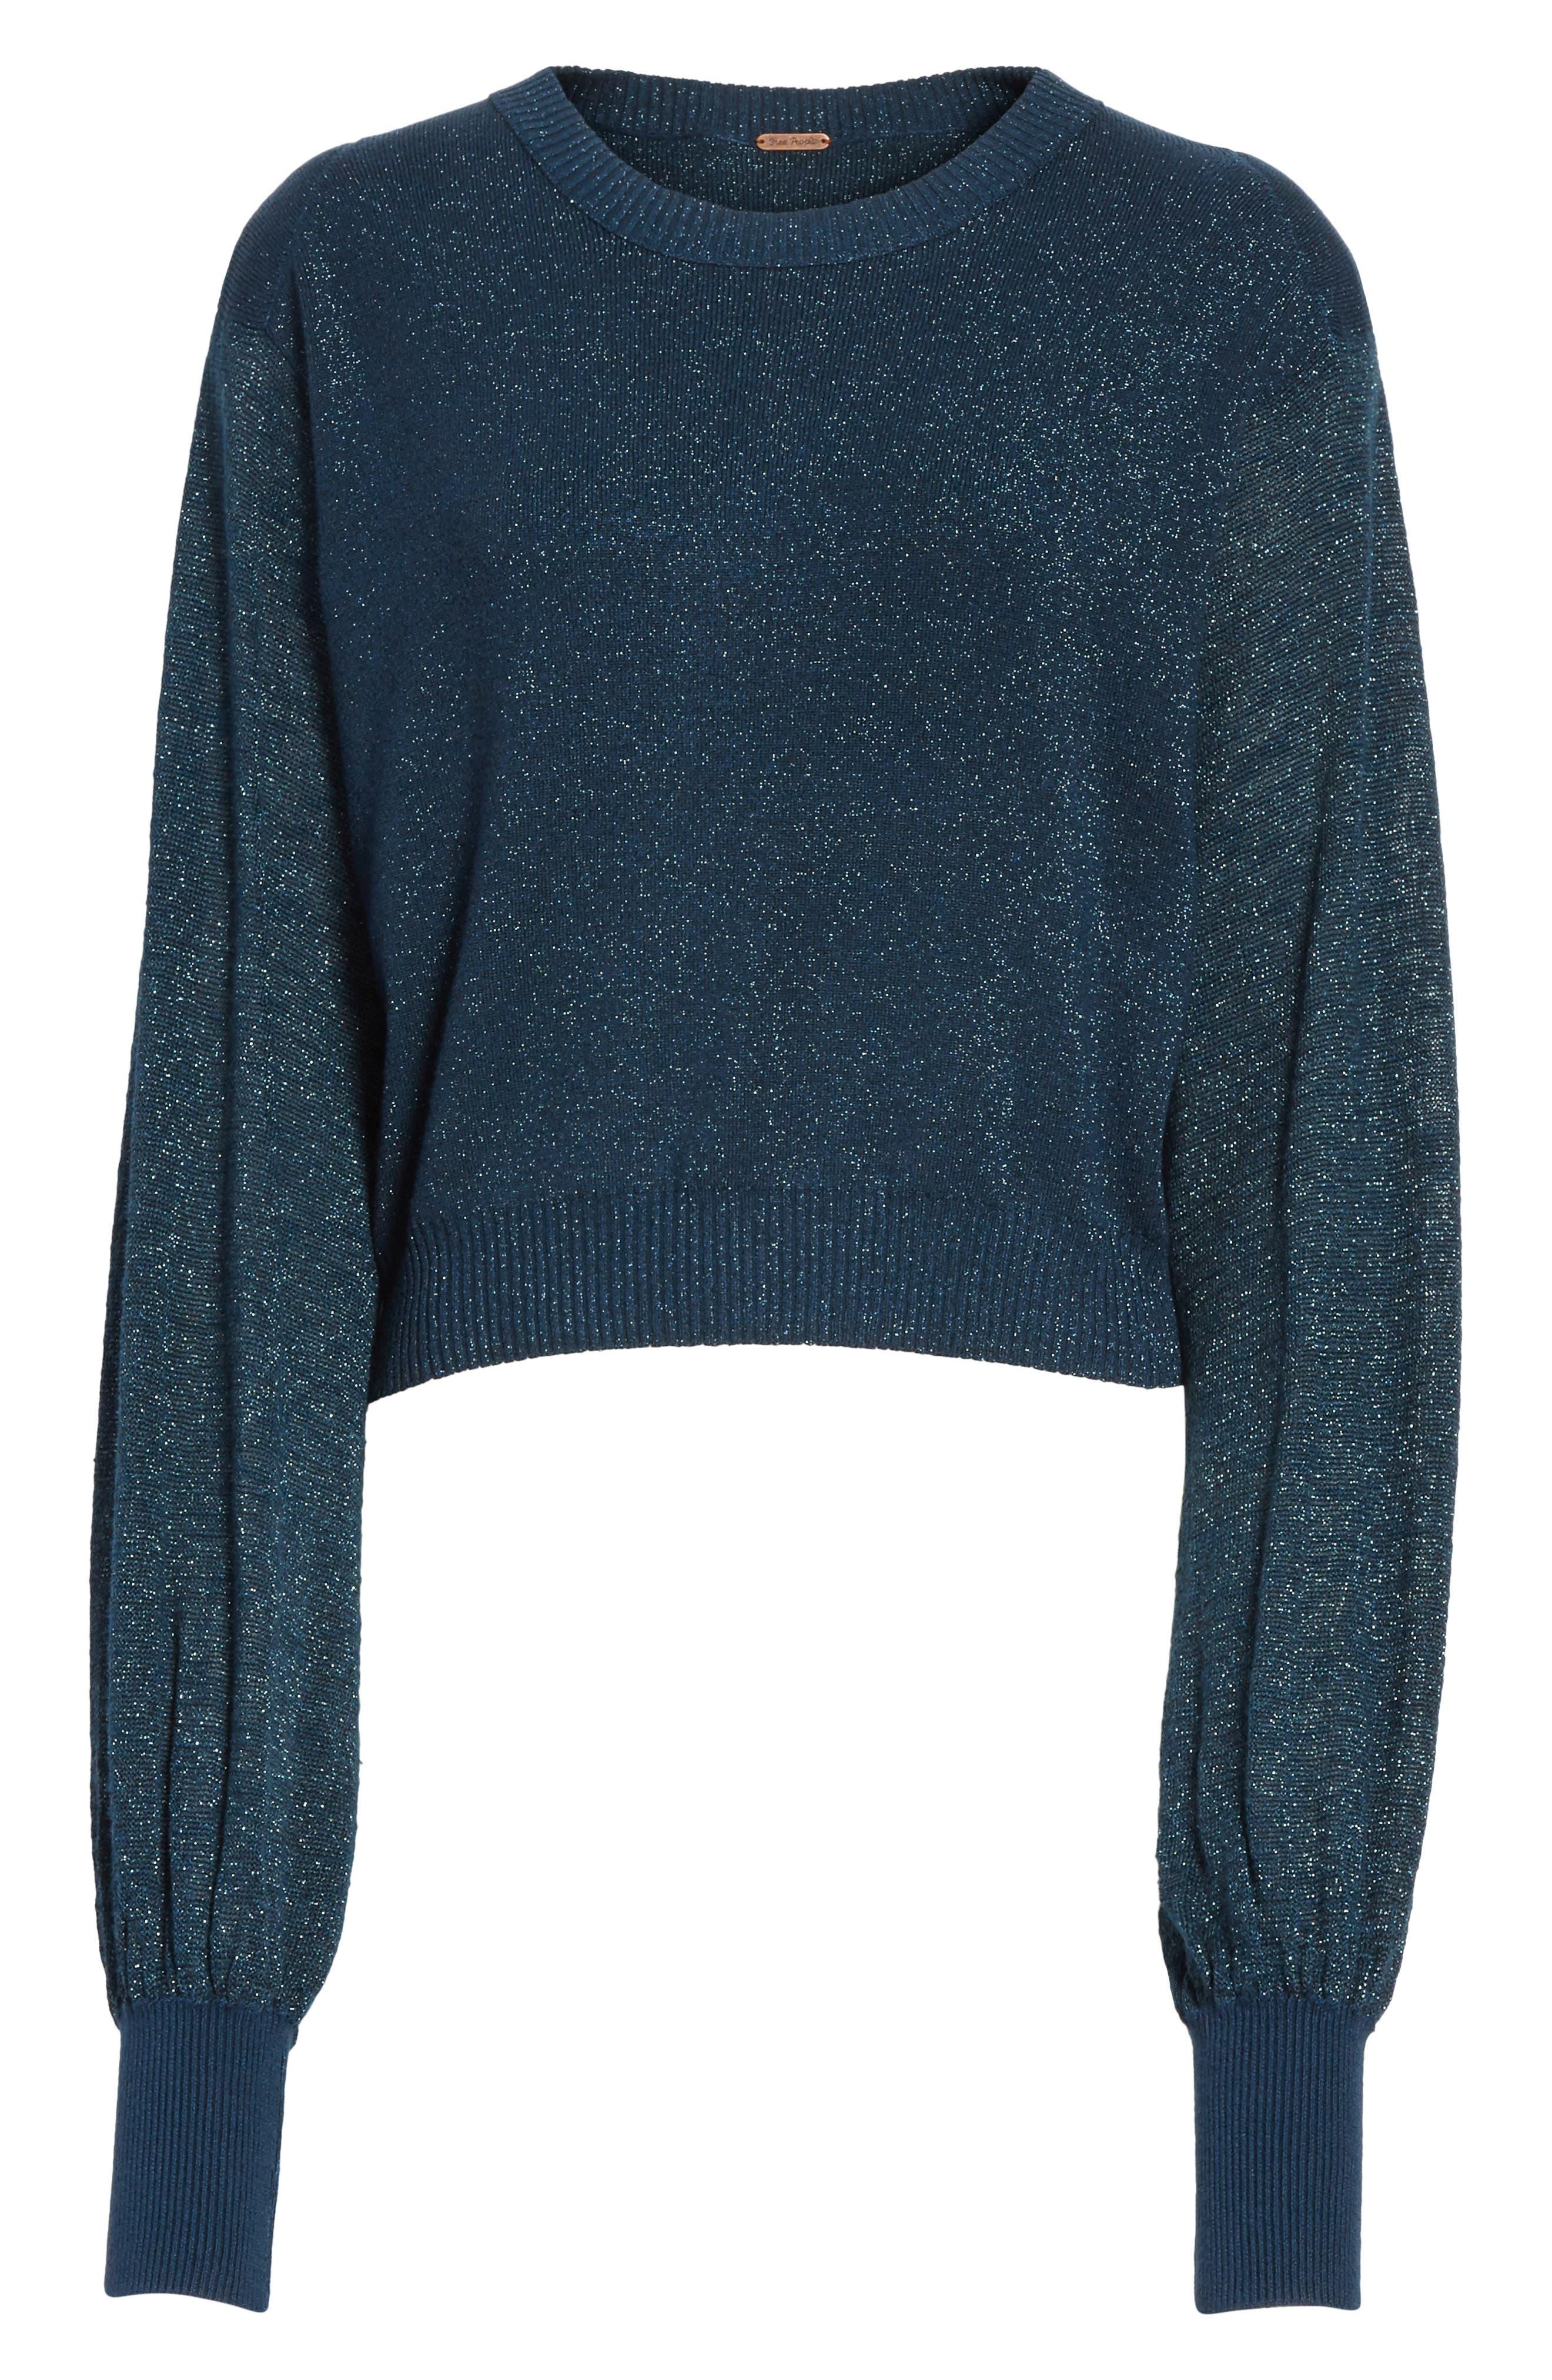 Let it Shine Sweater,                             Alternate thumbnail 16, color,